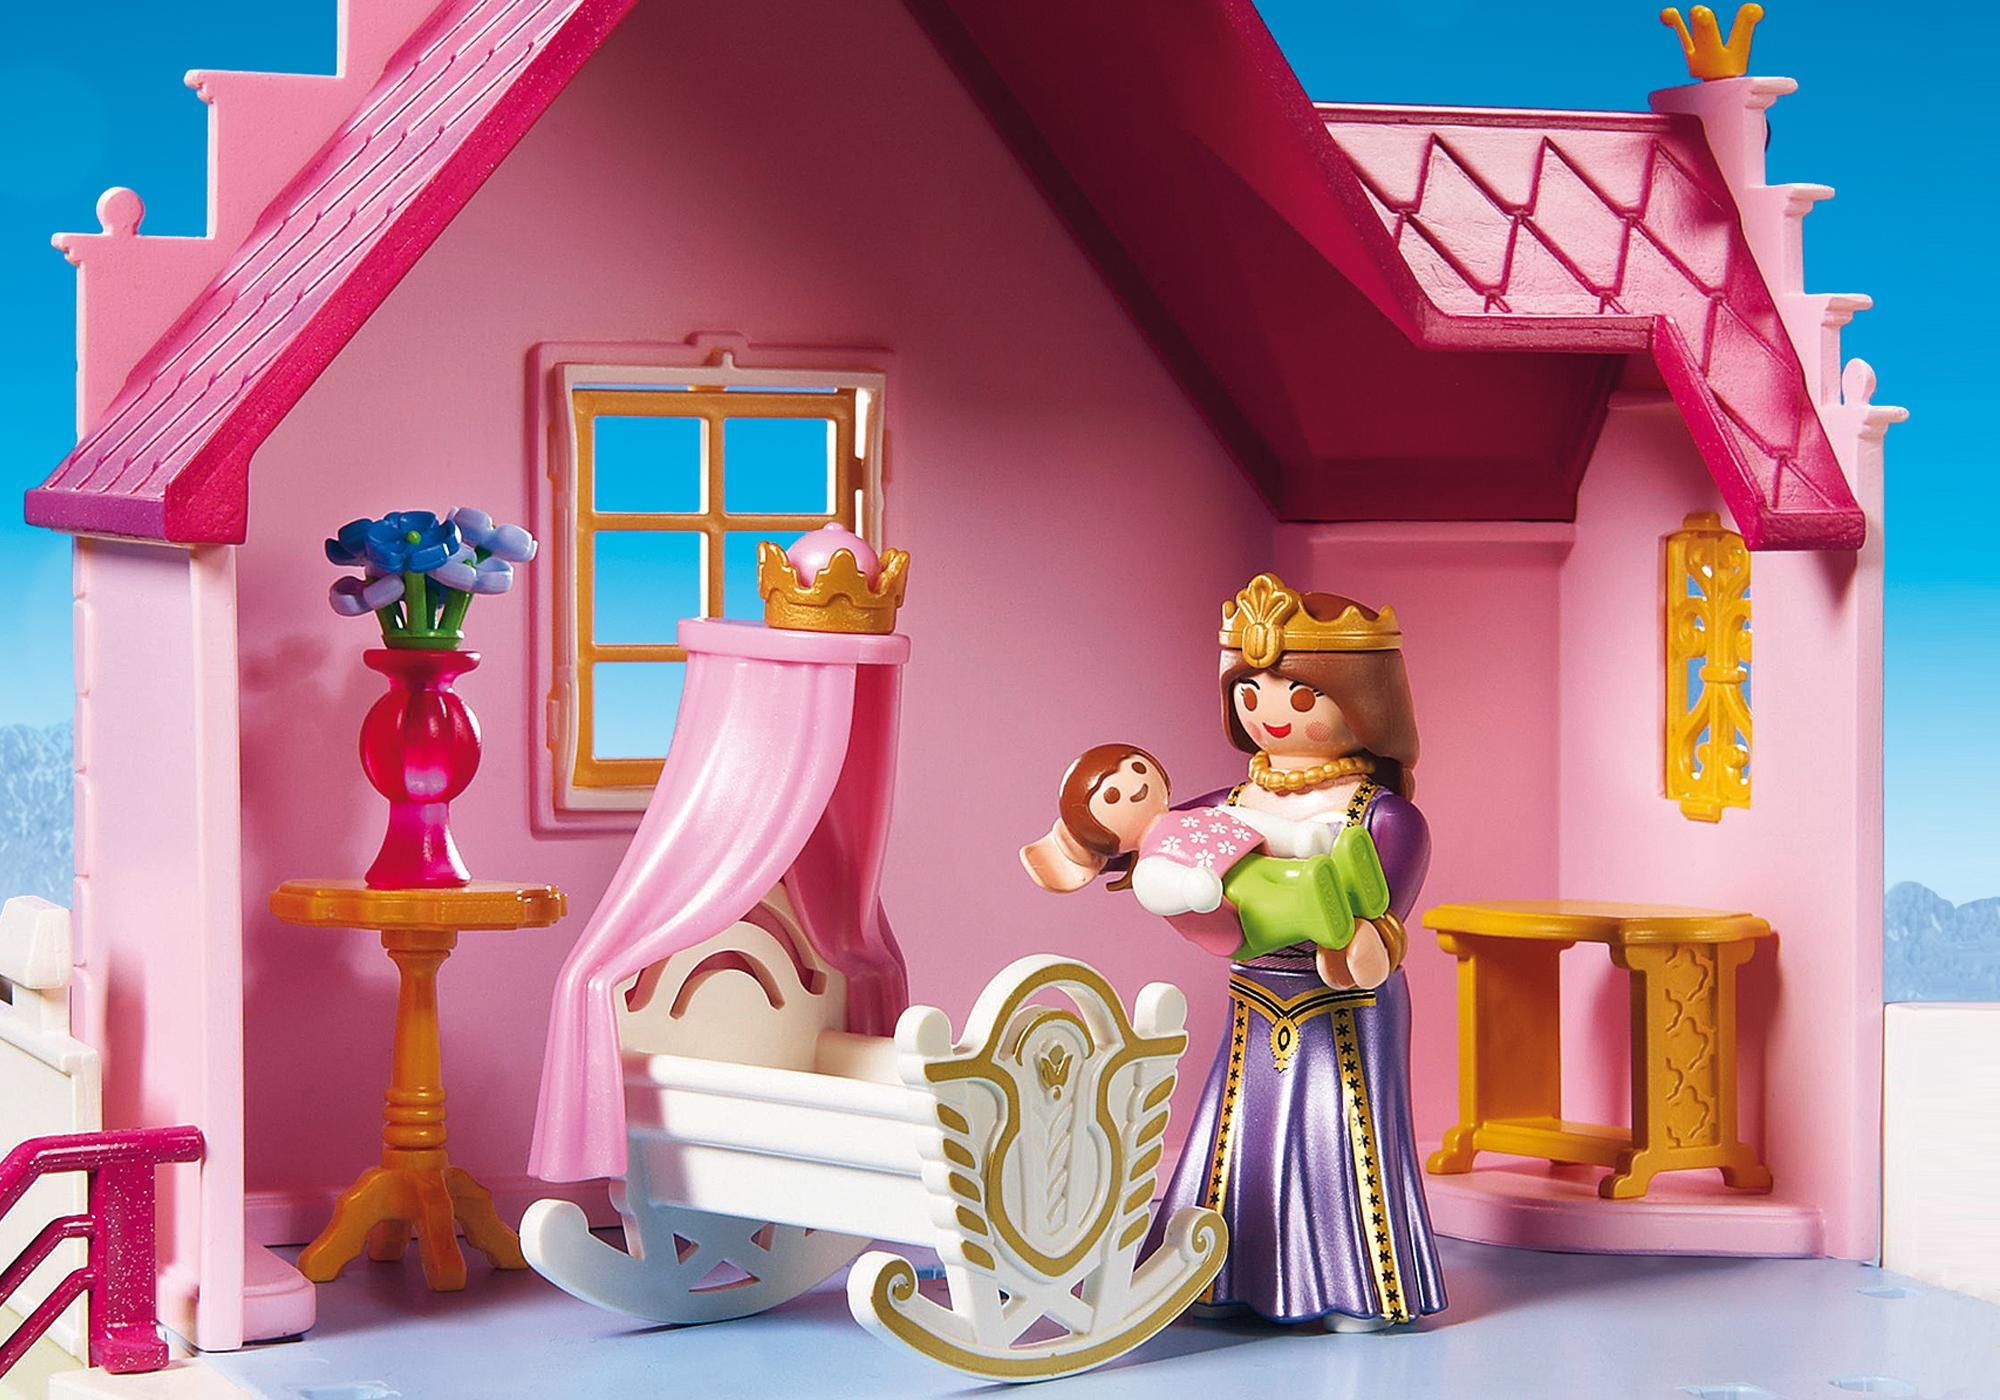 http://media.playmobil.com/i/playmobil/6849_product_extra3/Замок Принцессы: Королевская Резиденция